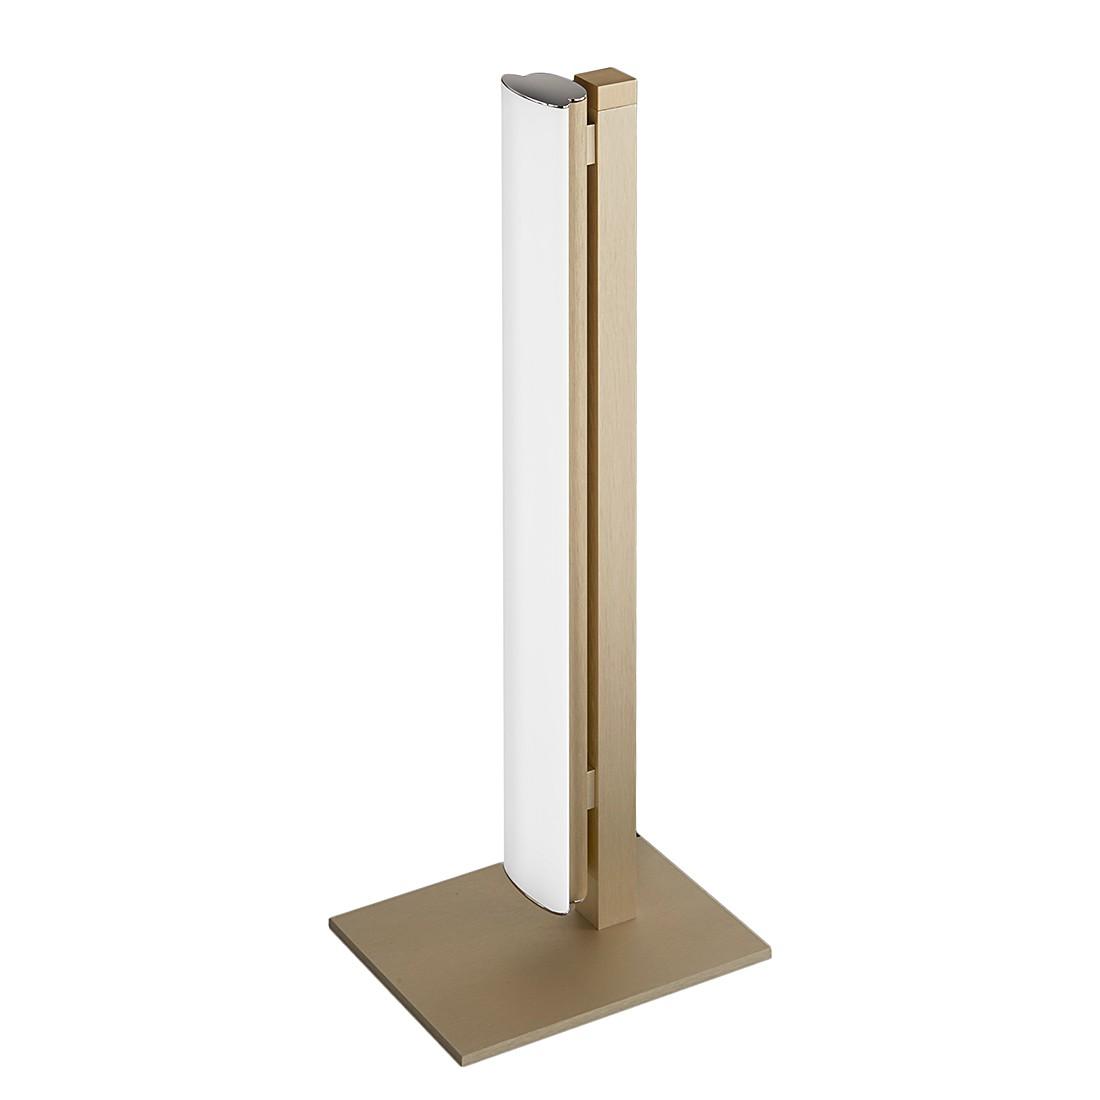 Tischleuchte VENTA ● Metall/Kunststoff ● Gold- Helestra A+